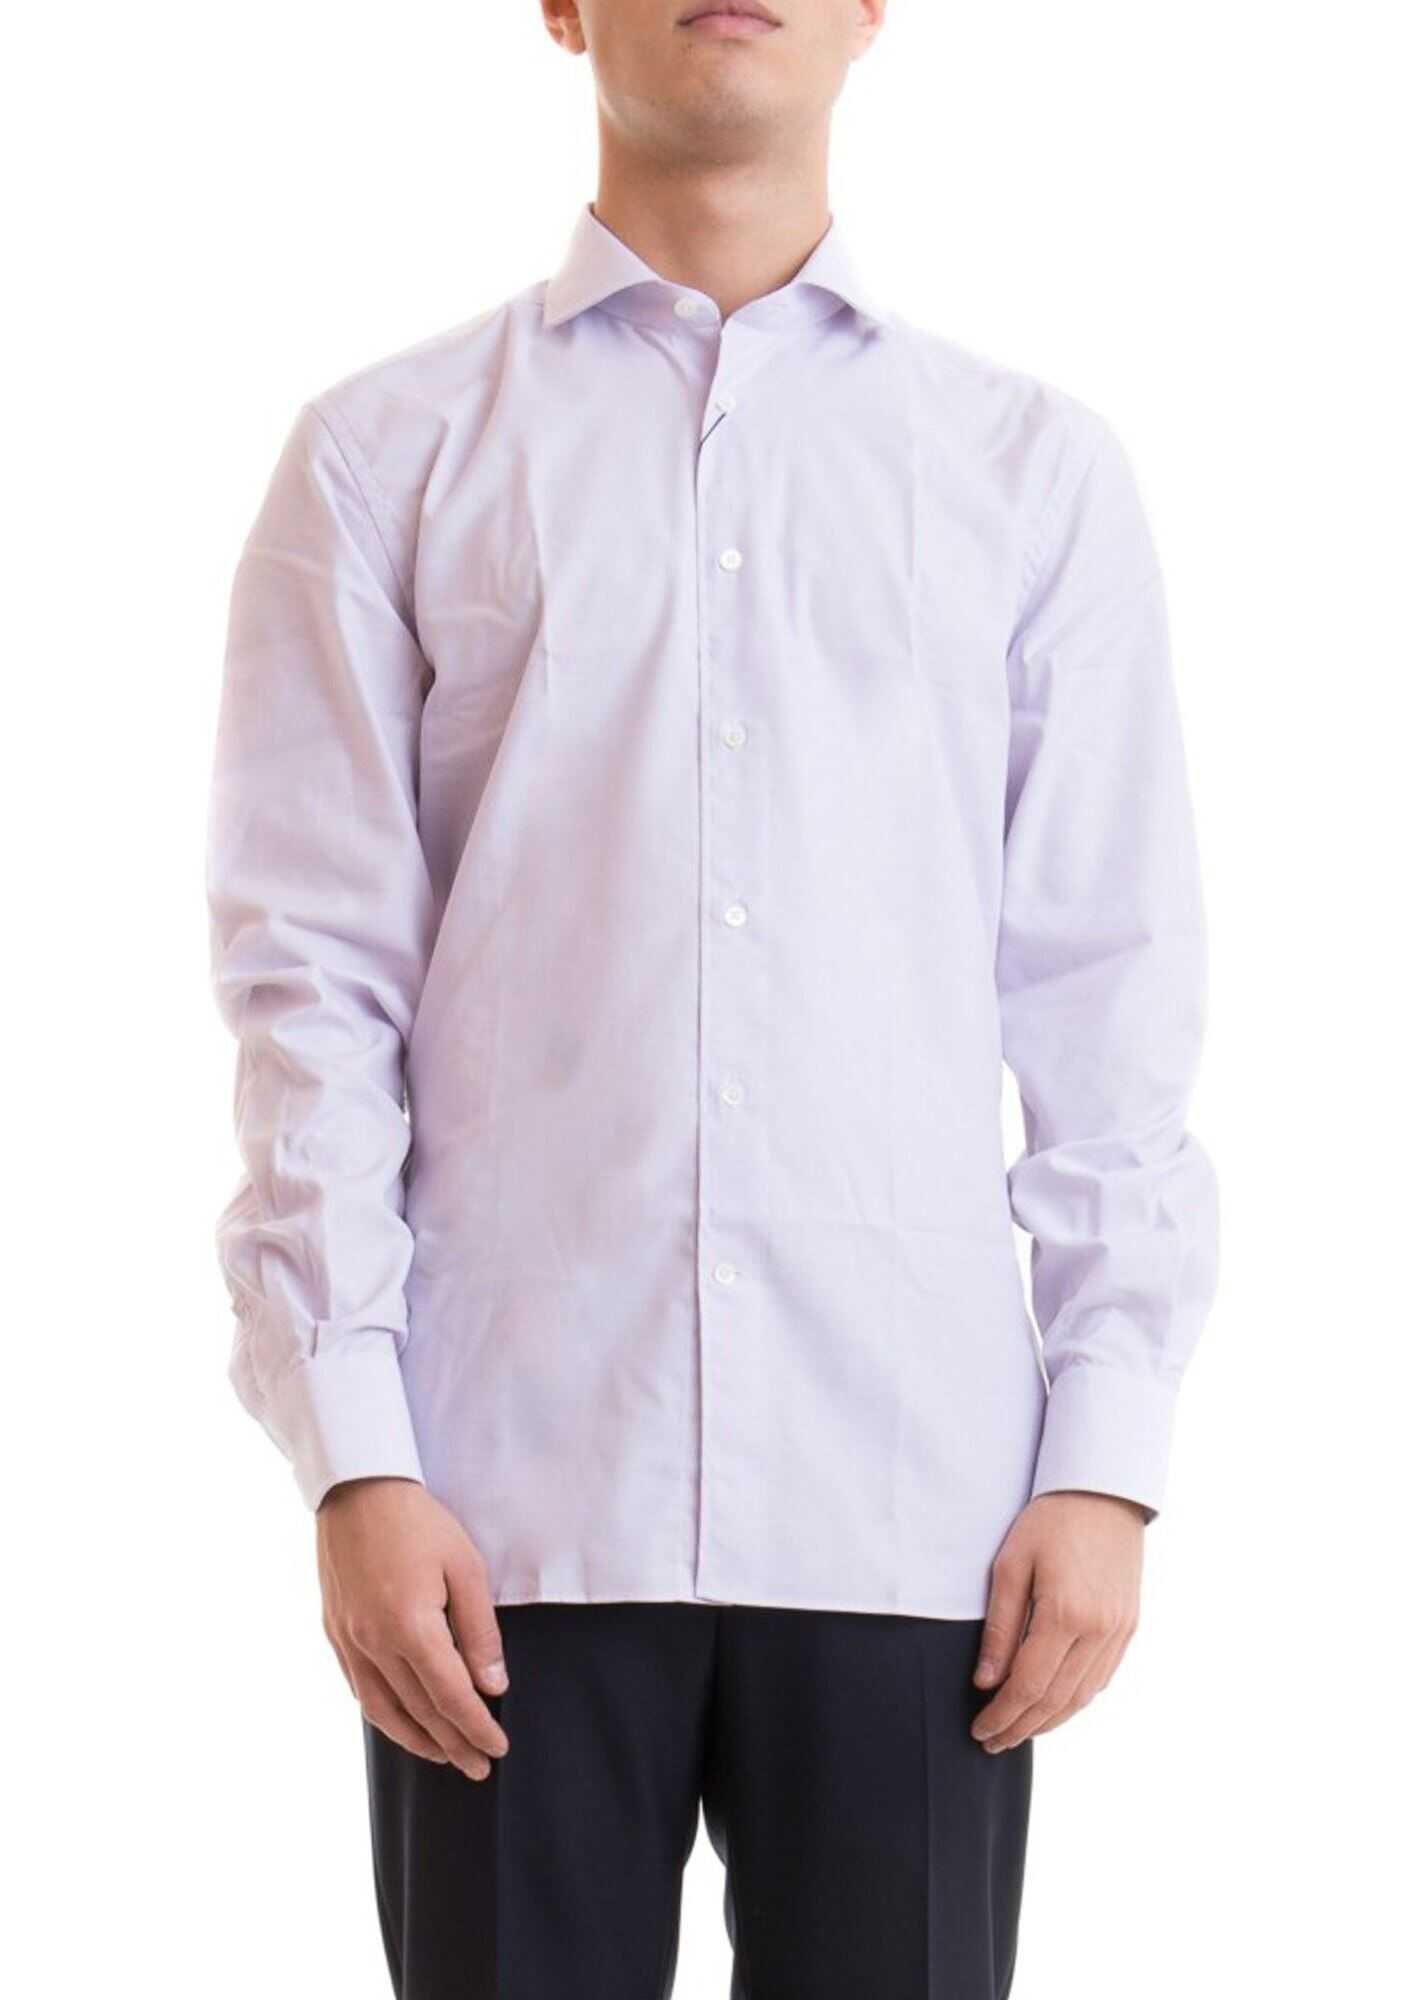 CORNELIANI Logo Patch Micro Check Cotton Shirt Purple imagine